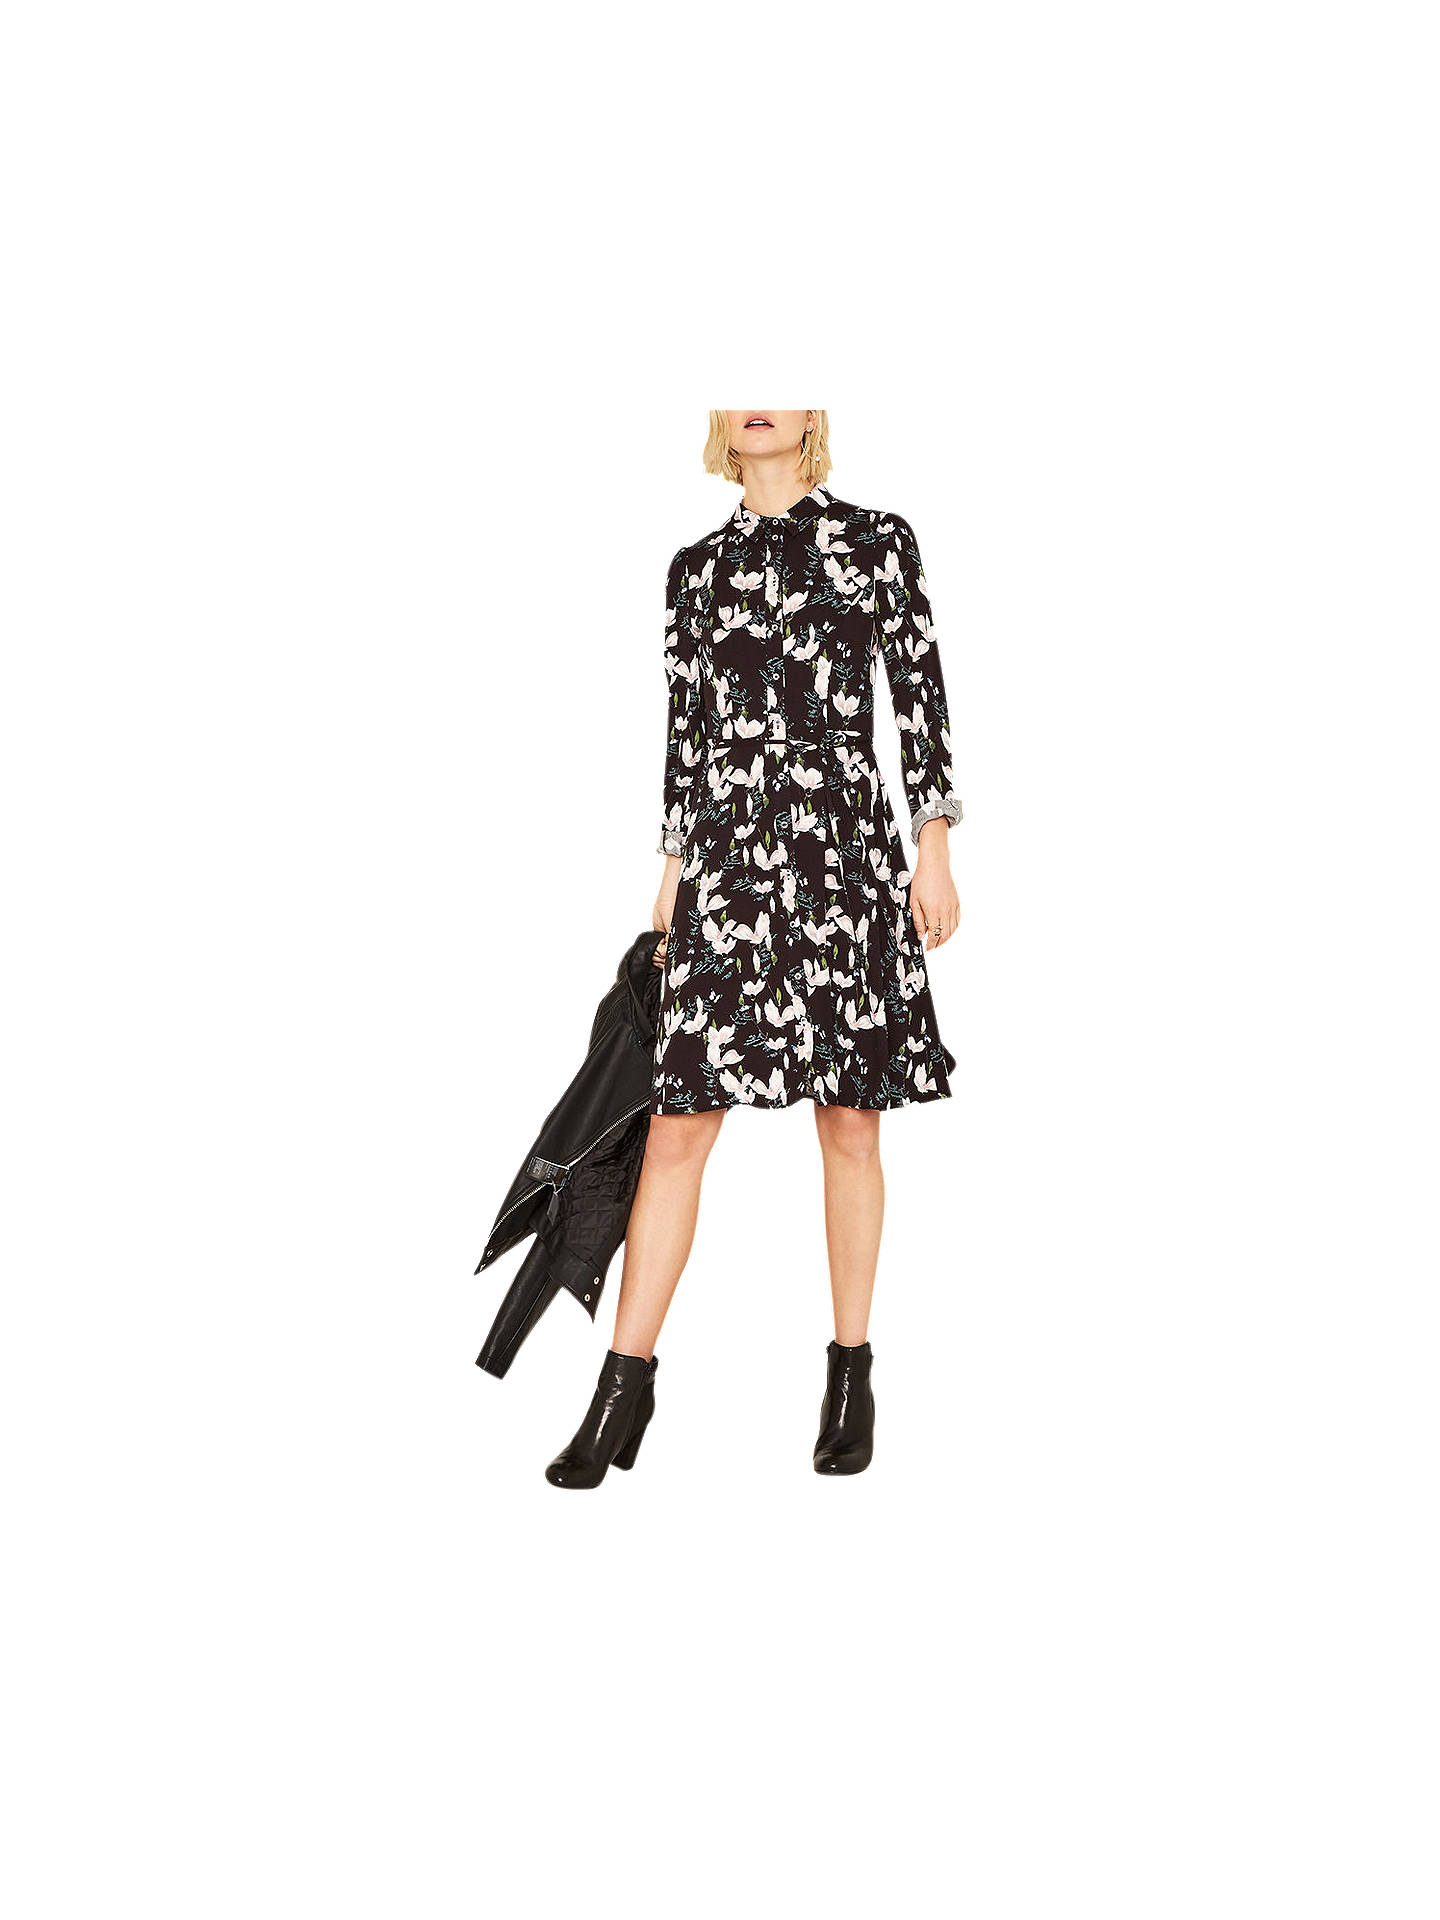 2f3119a6a9d0 Buy Oasis Magnolia Skater Shirt Dress